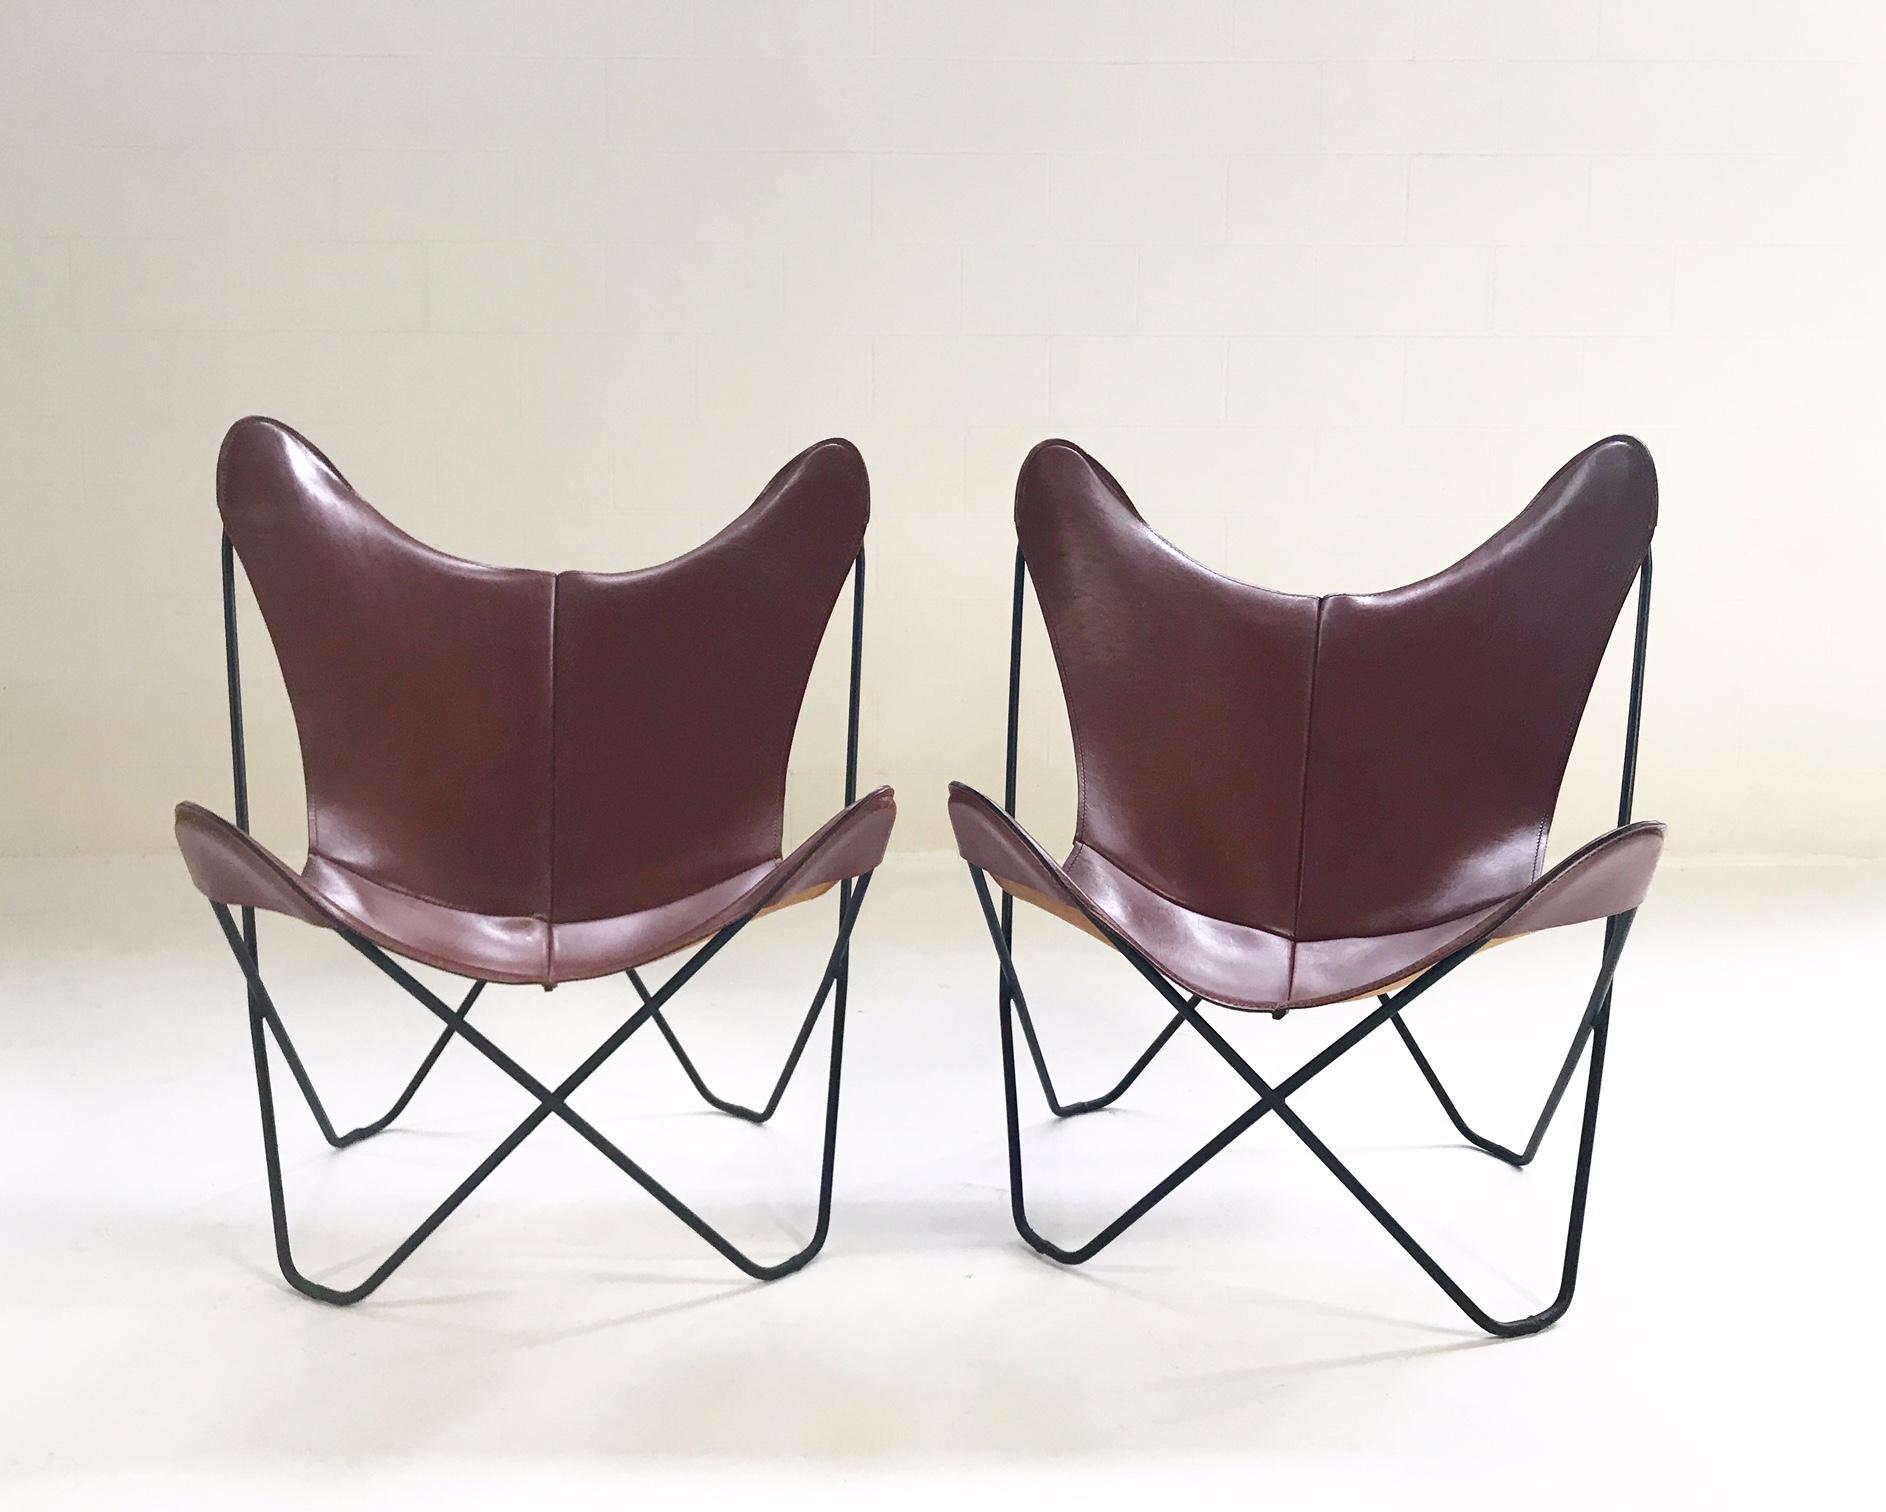 Great Vintage Antonio Bonet, Juan Kurchan, And Jorge Ferrari Hardoy For Knoll  Butterfly Chairs With